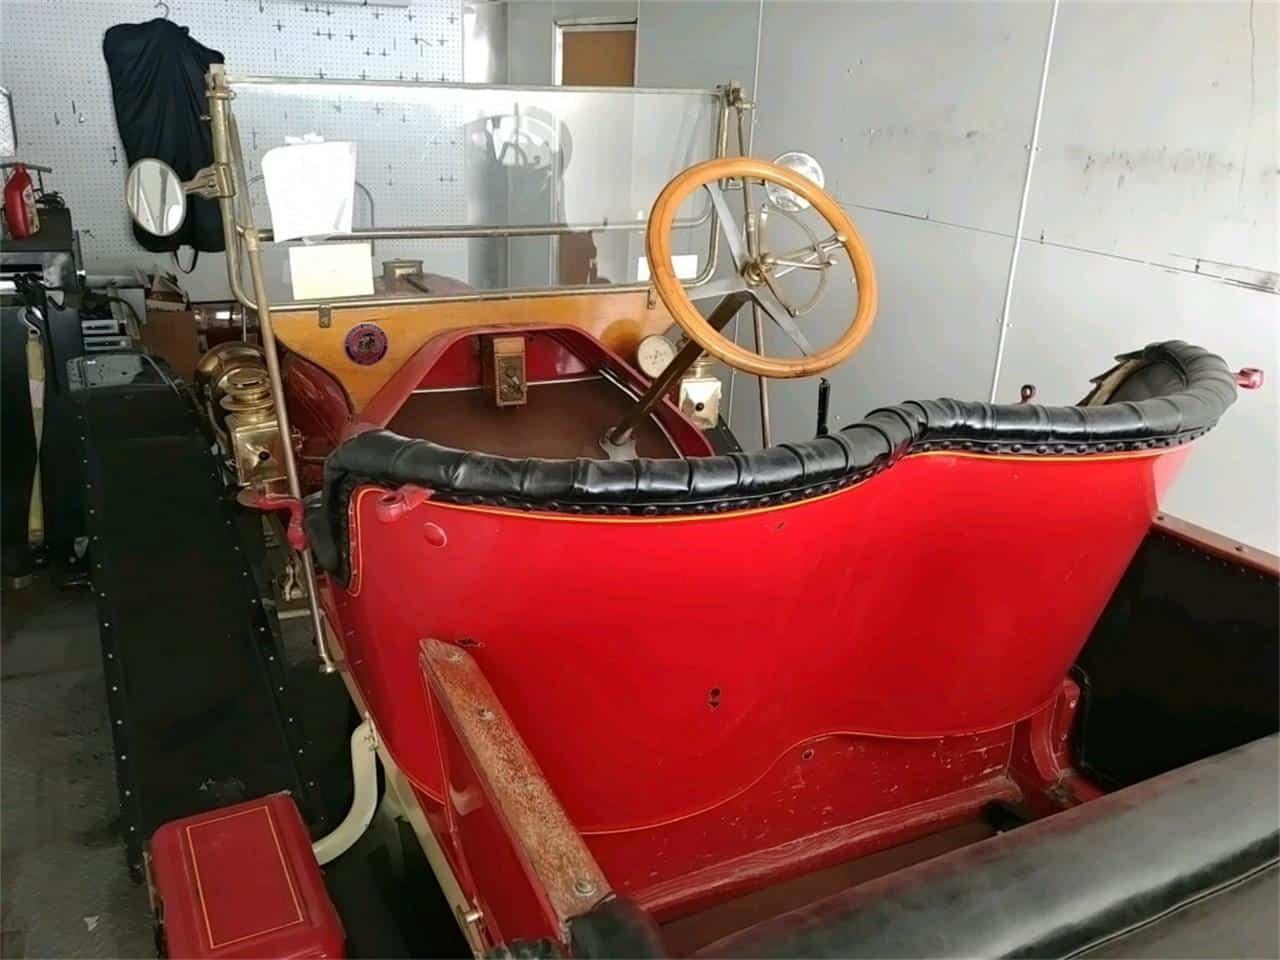 1909 Overland 38 Touring model